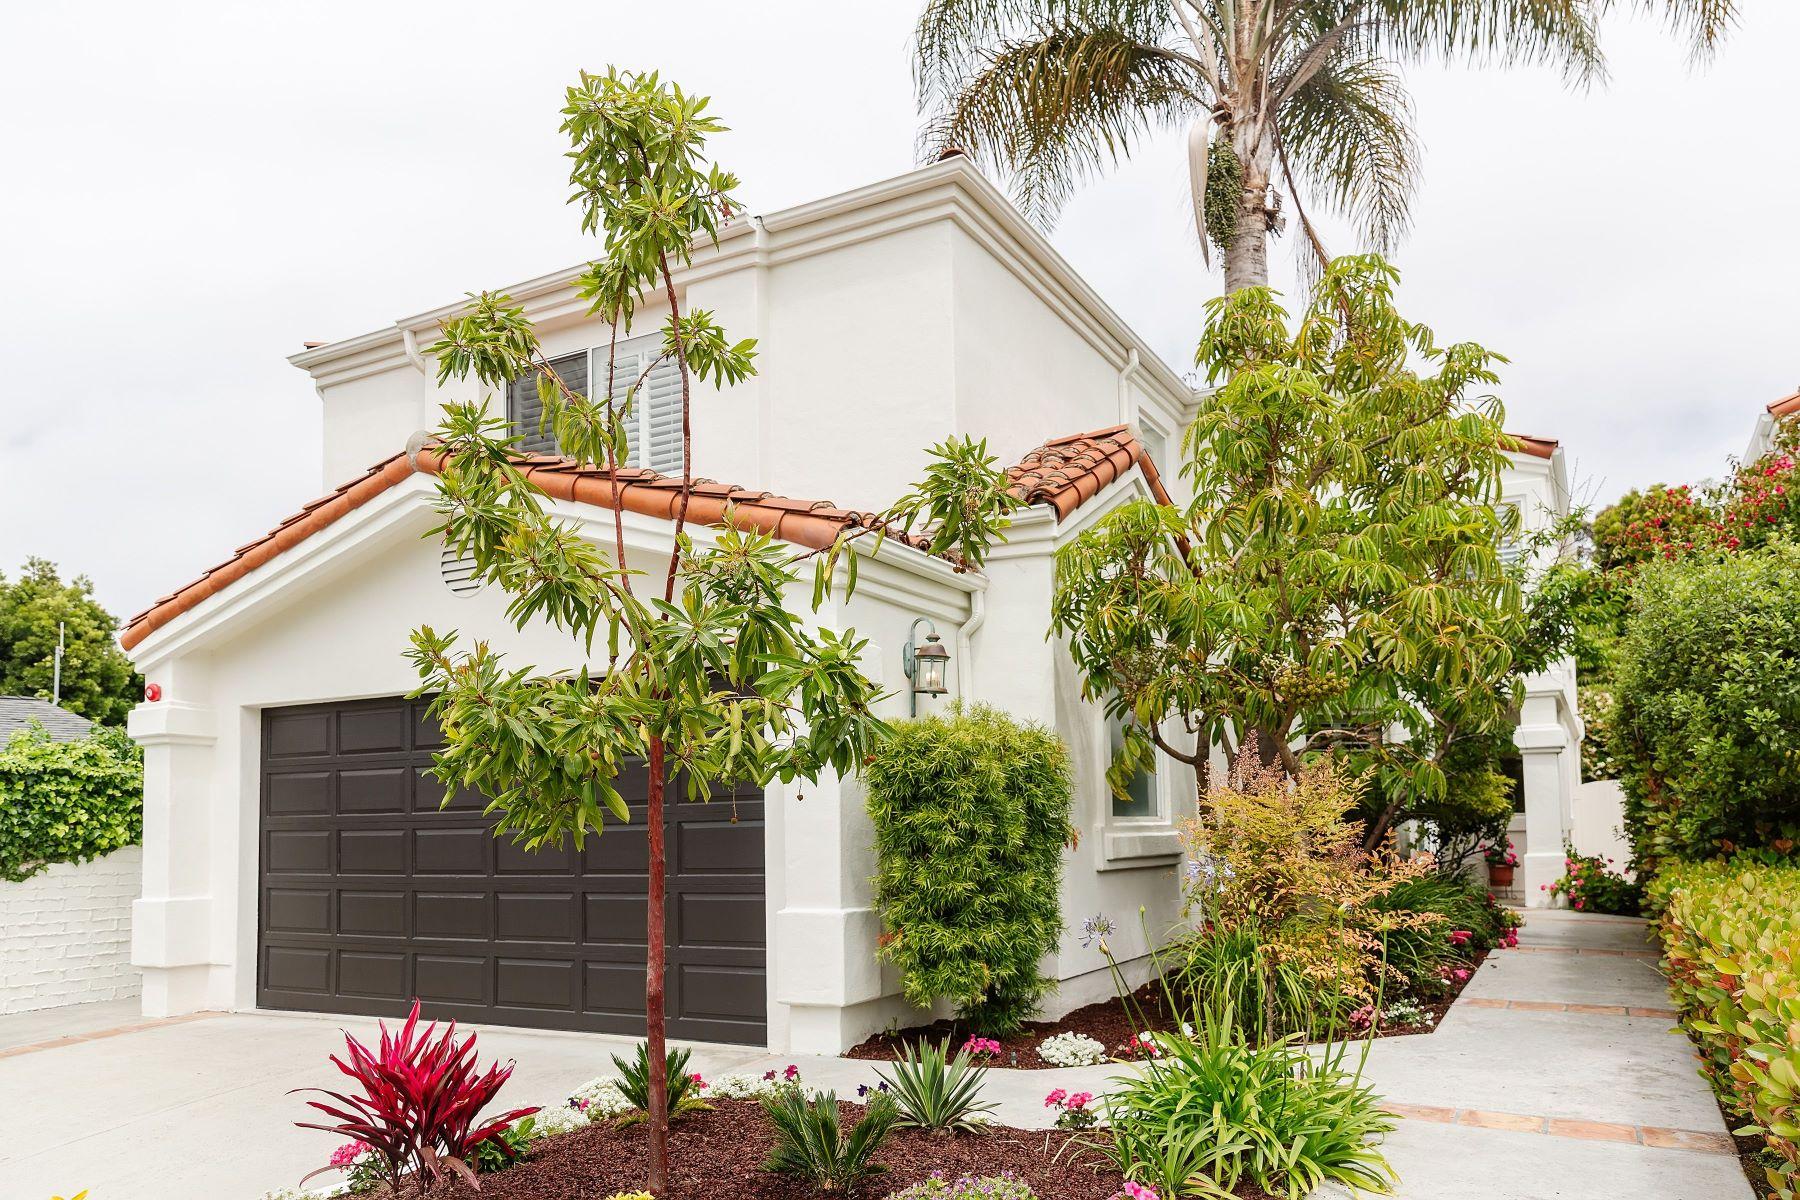 Single Family Homes por un Venta en 1420 Pine Avenue, Manhattan Beach, CA 90266 1420 Pine Avenue Manhattan Beach, California 90266 Estados Unidos